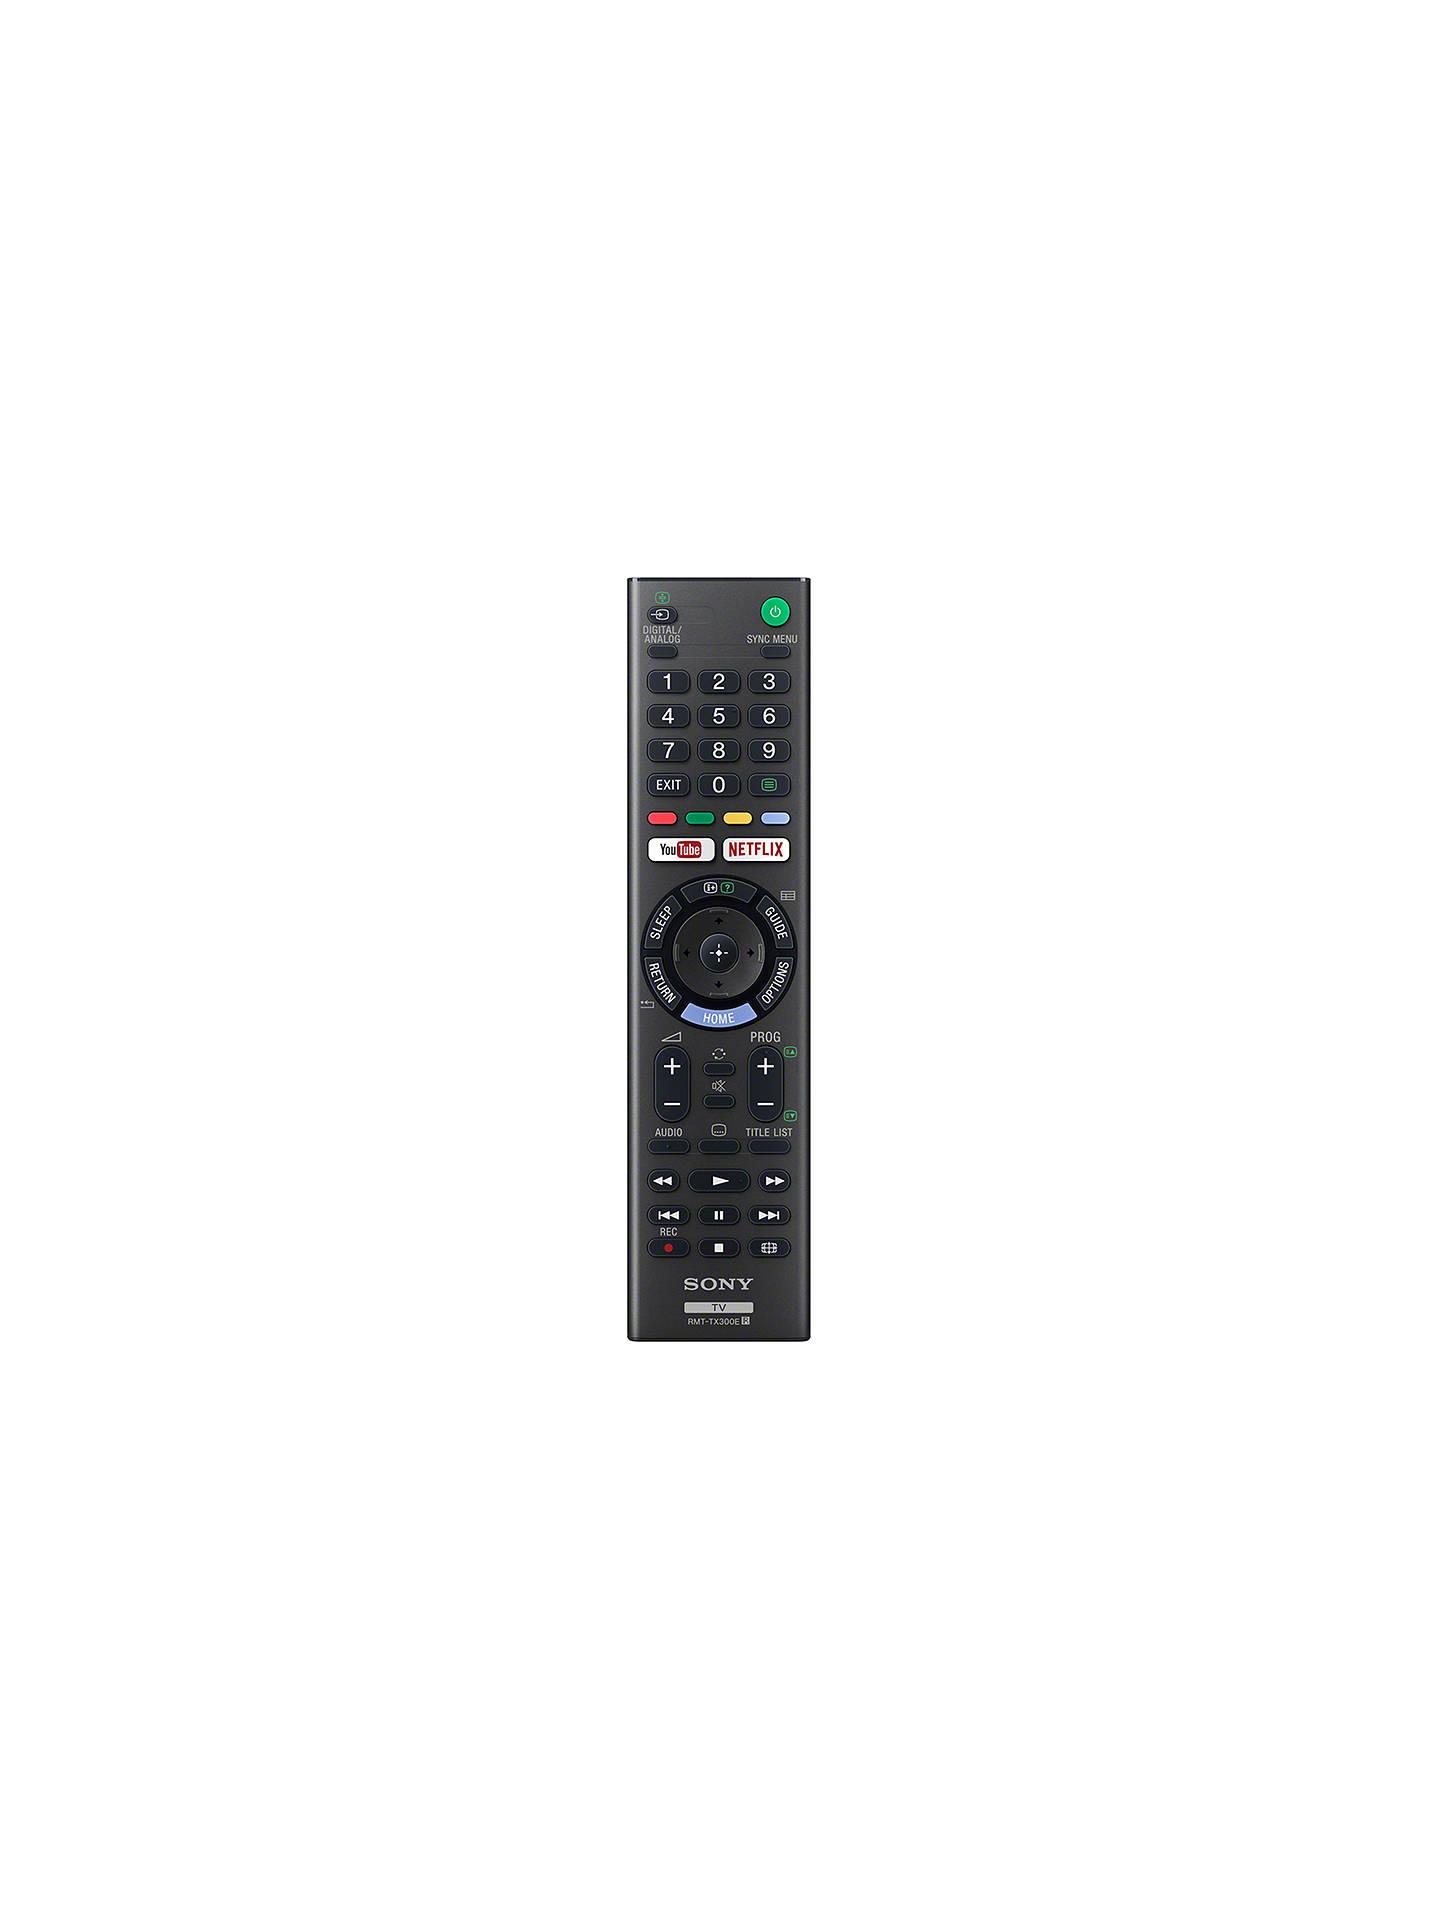 Sony Bravia KDL40WE663 LED HDR Full HD 1080p Smart TV, 40